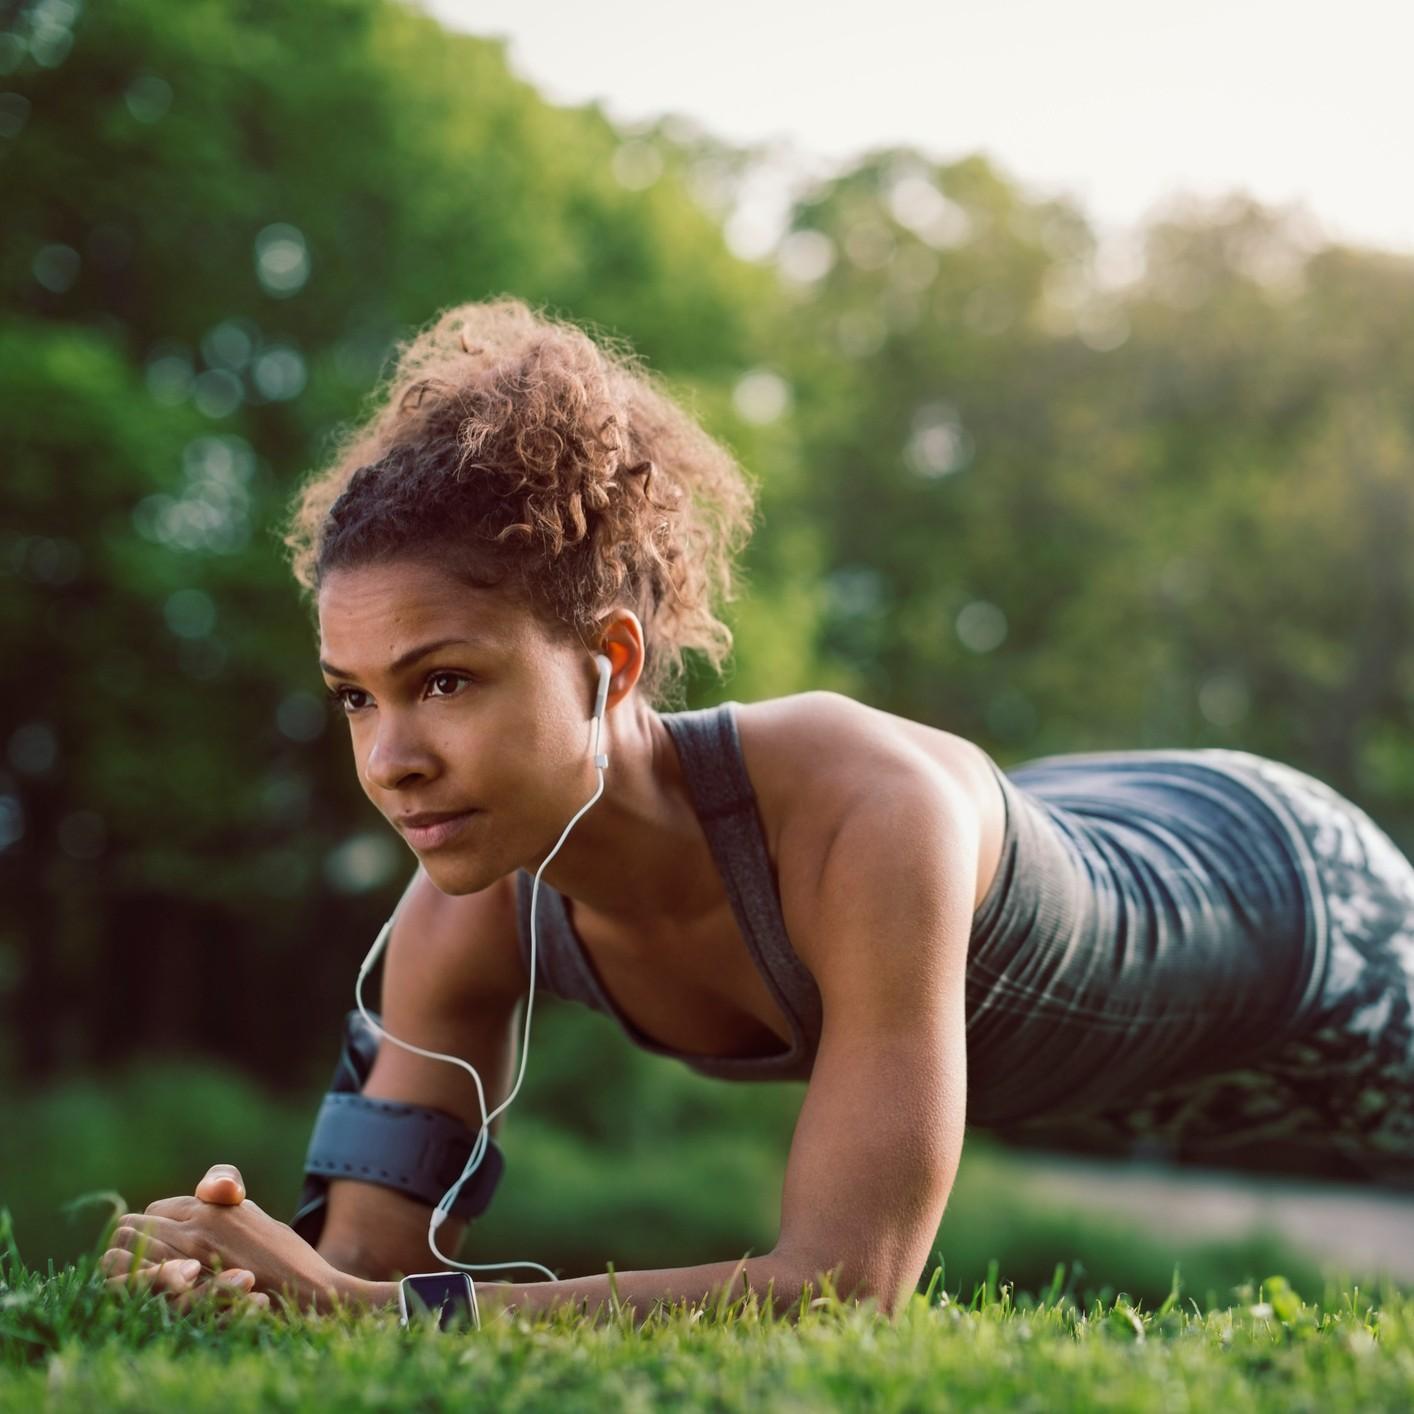 va rog, ajutati-masunt anorexica si disperata | Forumul Medical ROmedic